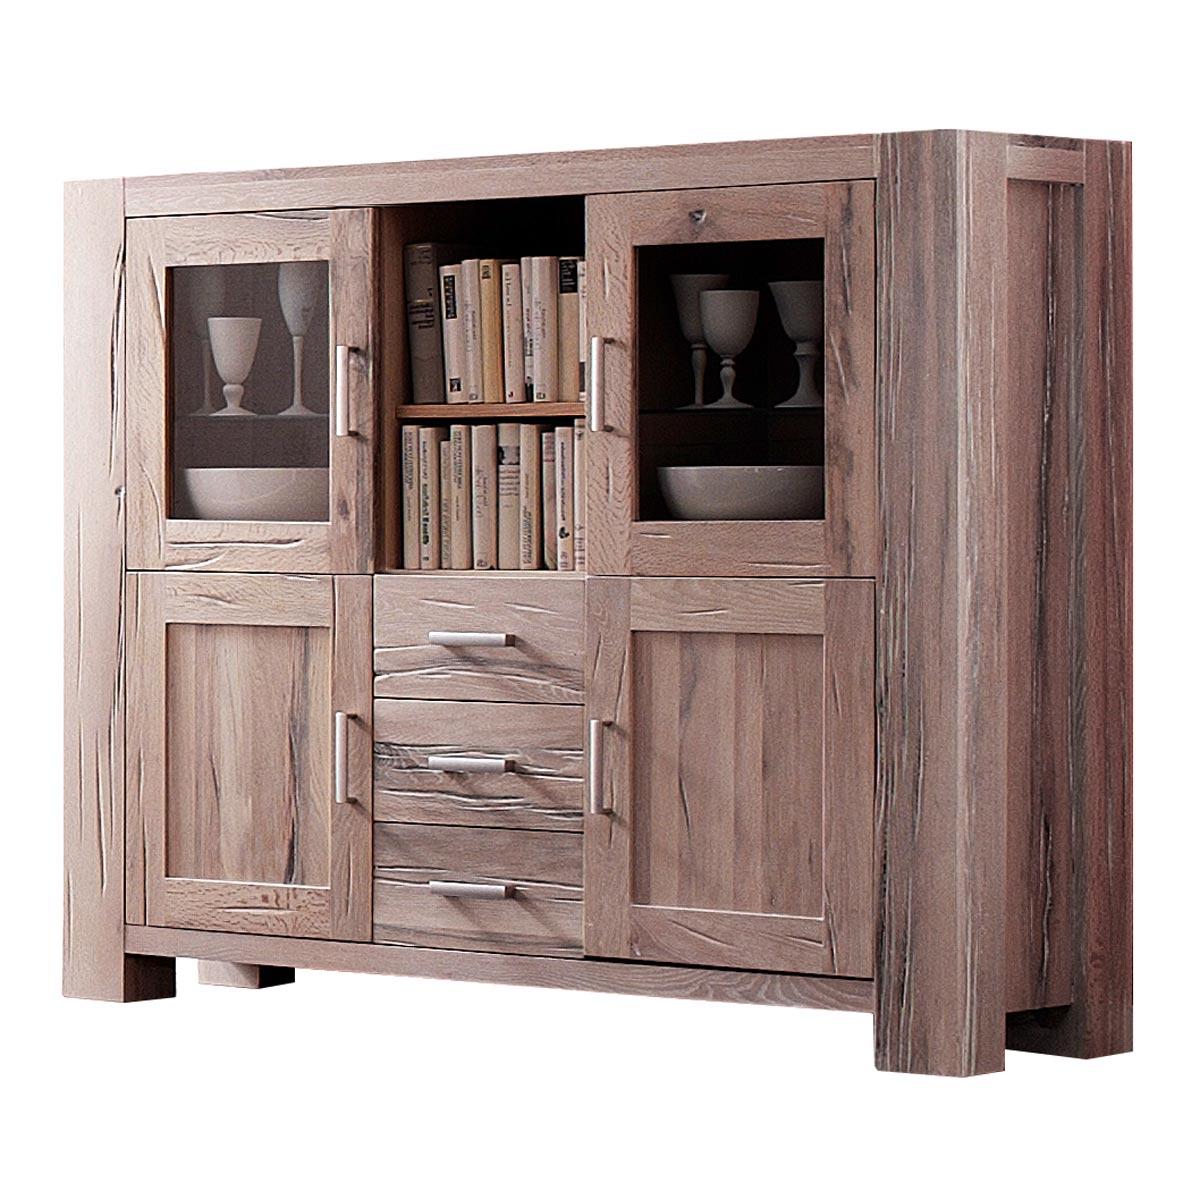 highboard braxton in eiche massiv wei gek lkt. Black Bedroom Furniture Sets. Home Design Ideas